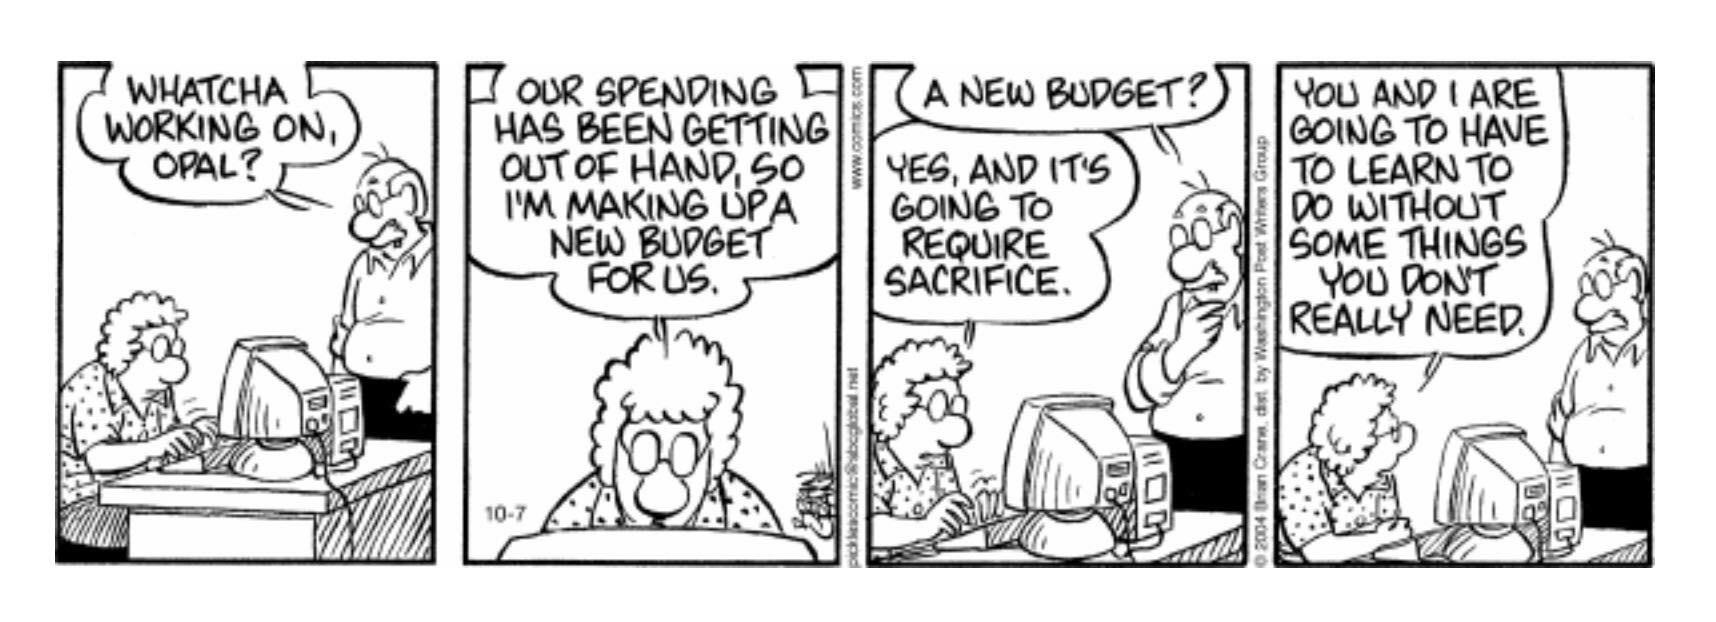 Finance Comic